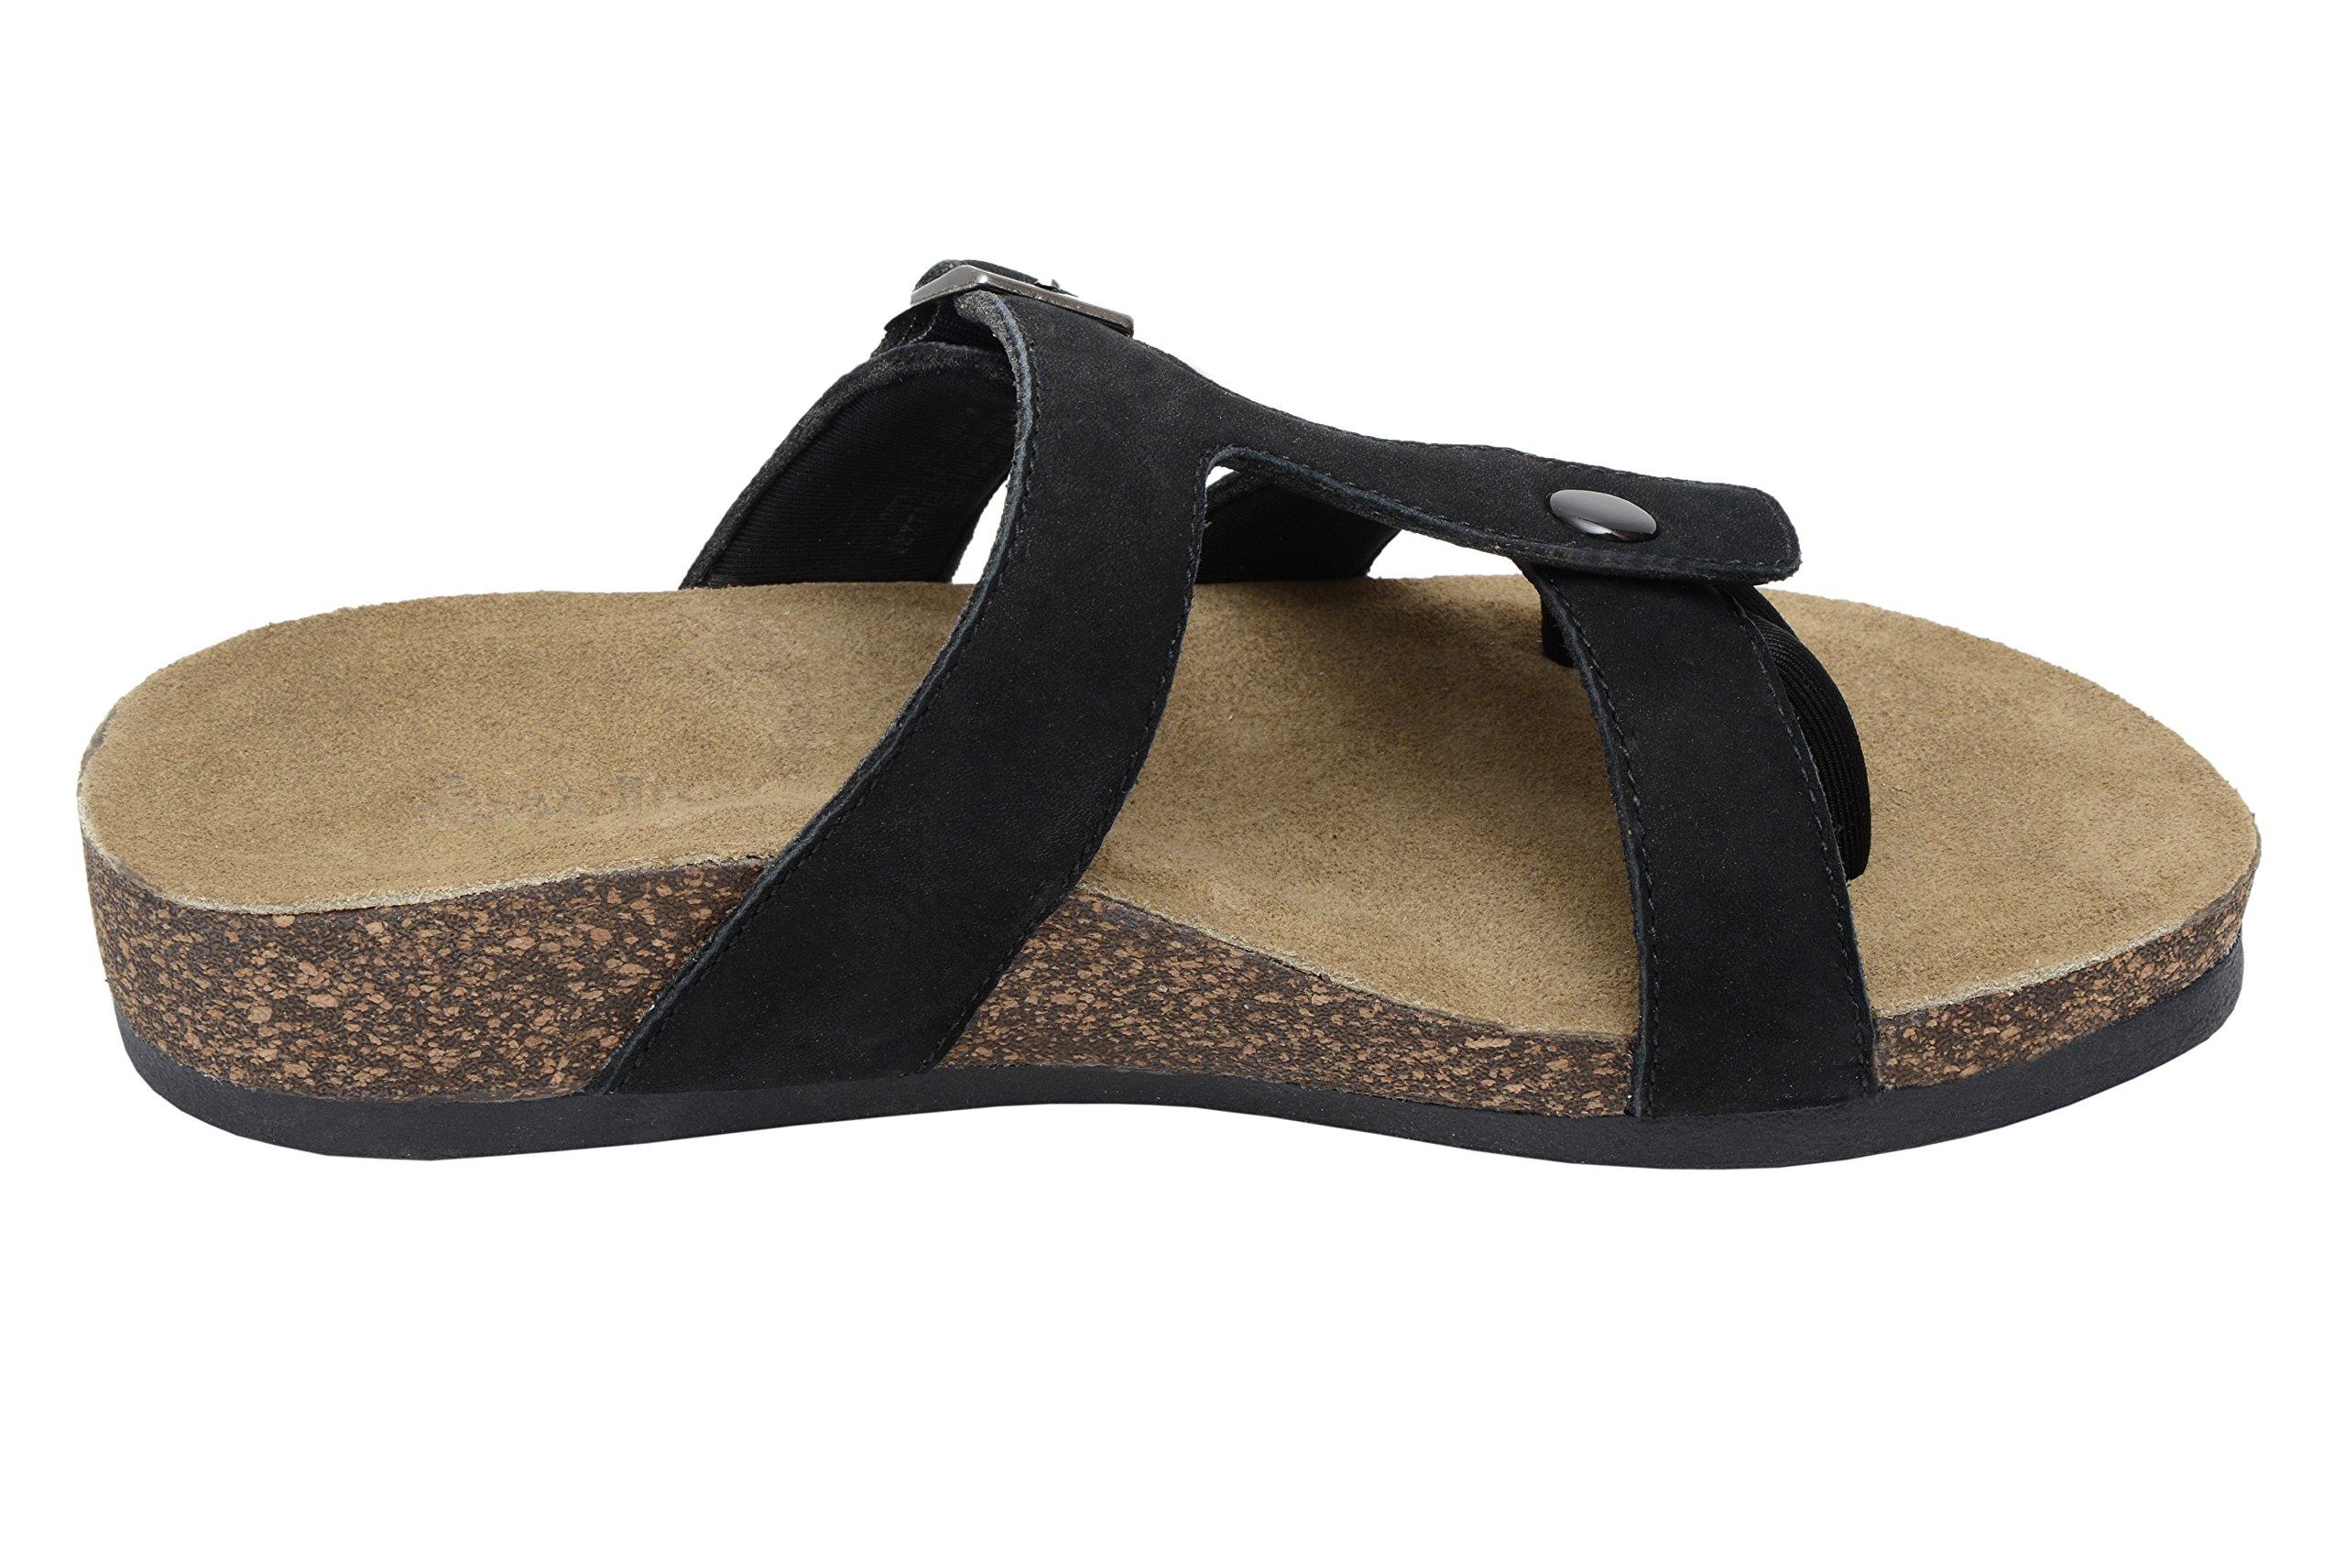 Wellrox Women's Santa Fee-Sedona Black Nubuck Casual Sandal 6